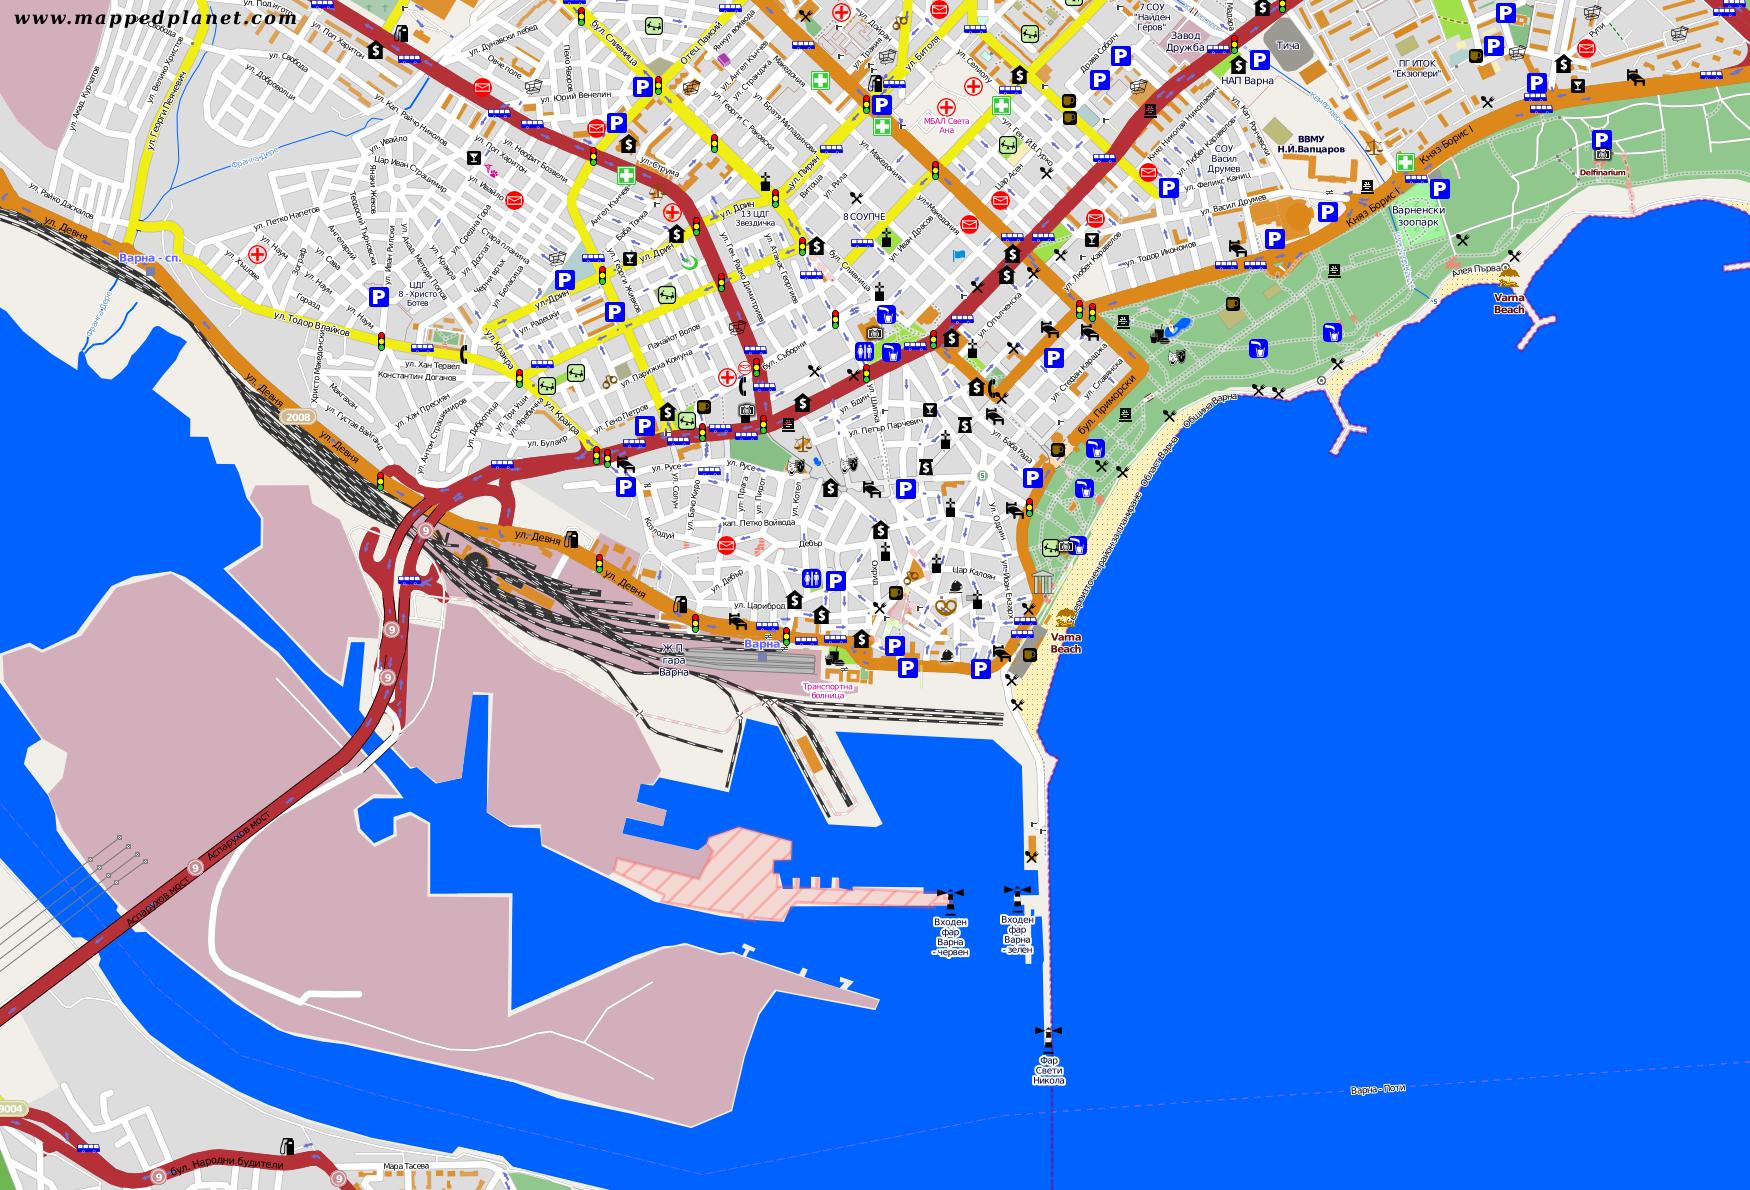 City Maps Varna - Varna map